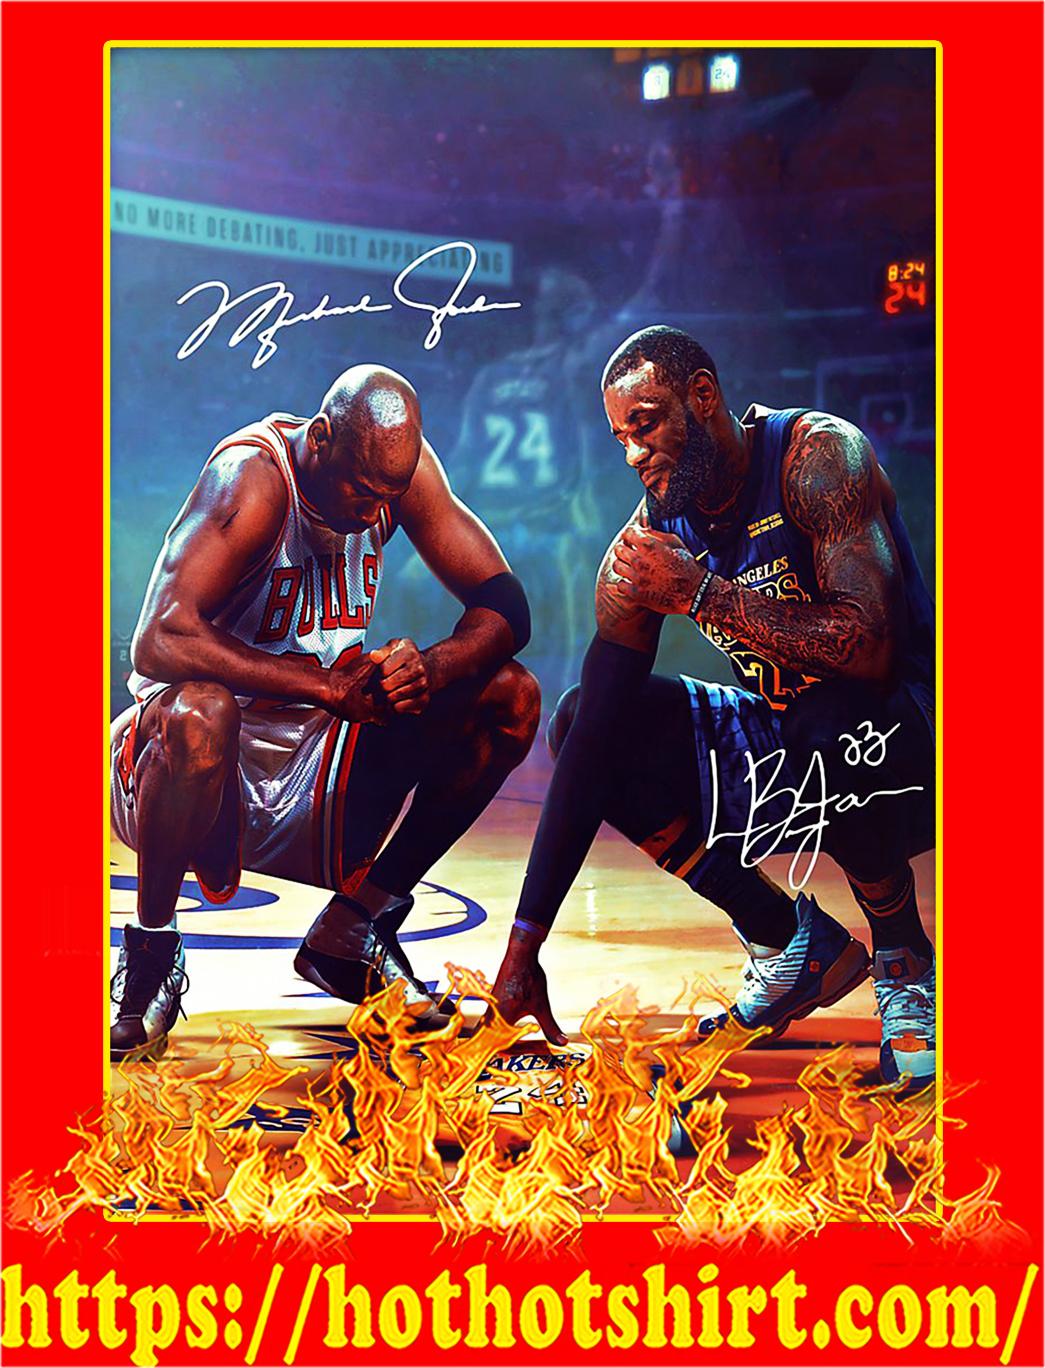 Michael jordan and lebron james poster - A3